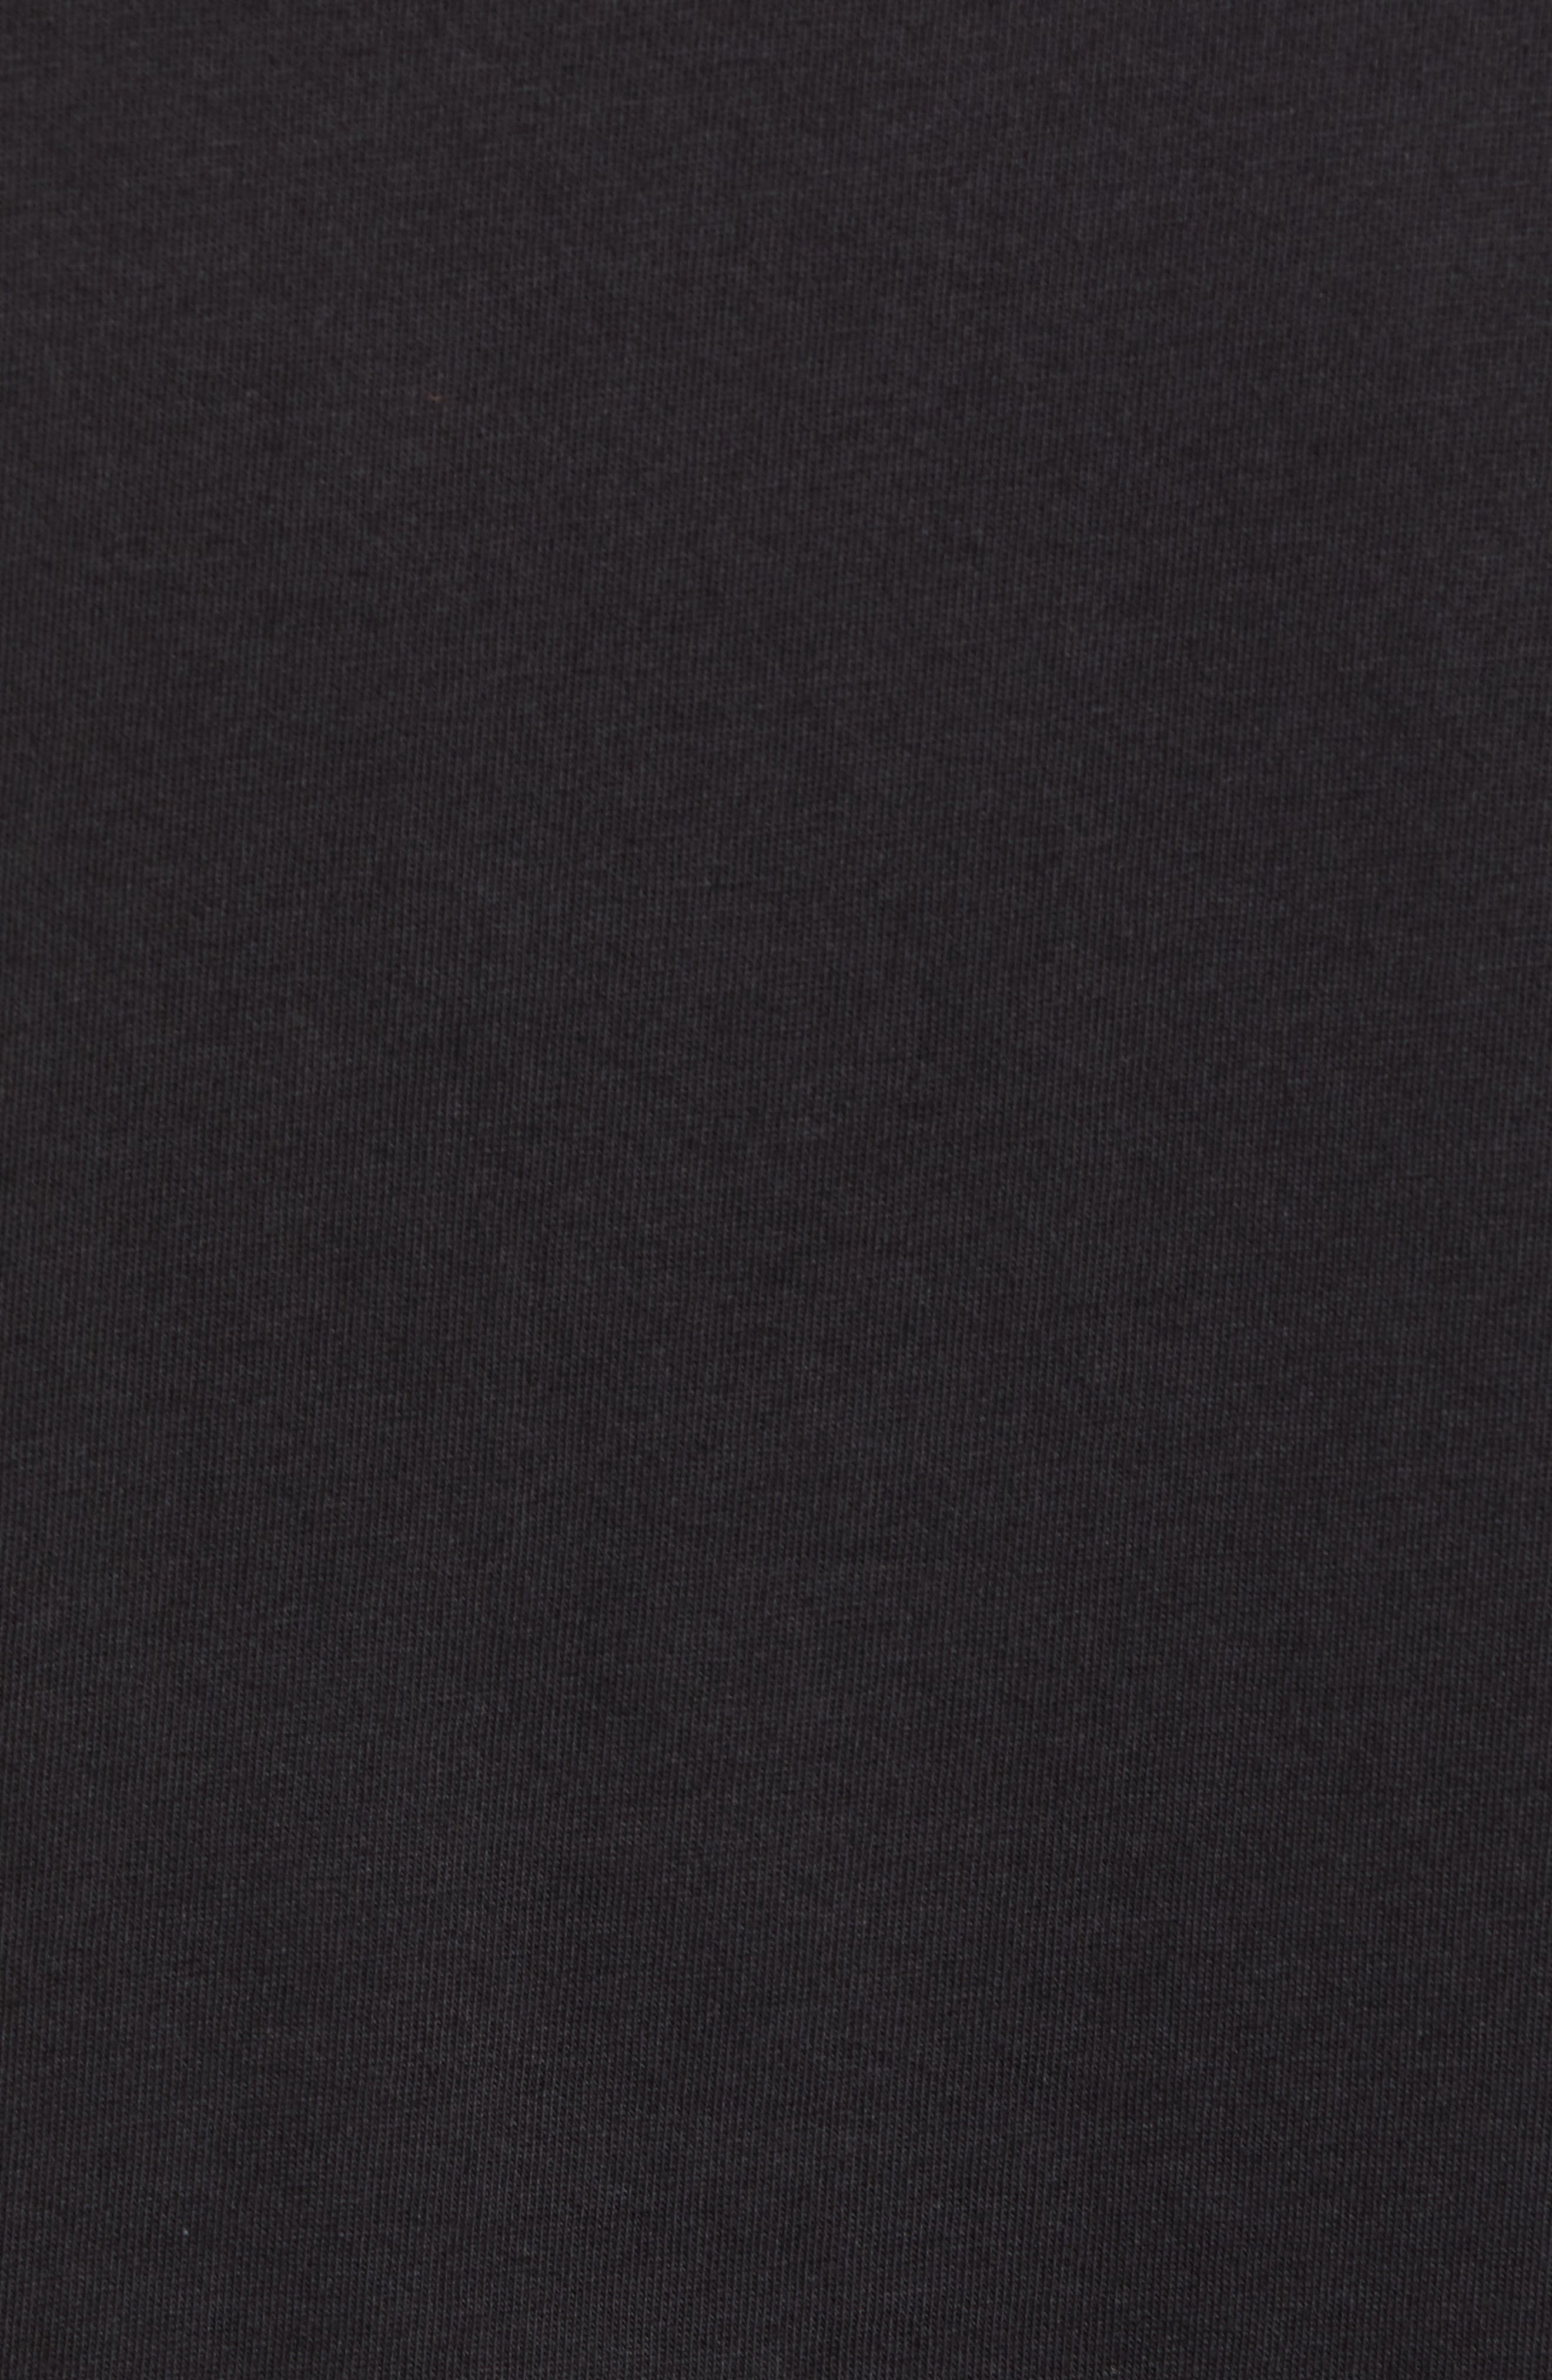 Community T-Shirt,                             Alternate thumbnail 5, color,                             I AM RAINBOW GRADIENT BLACK